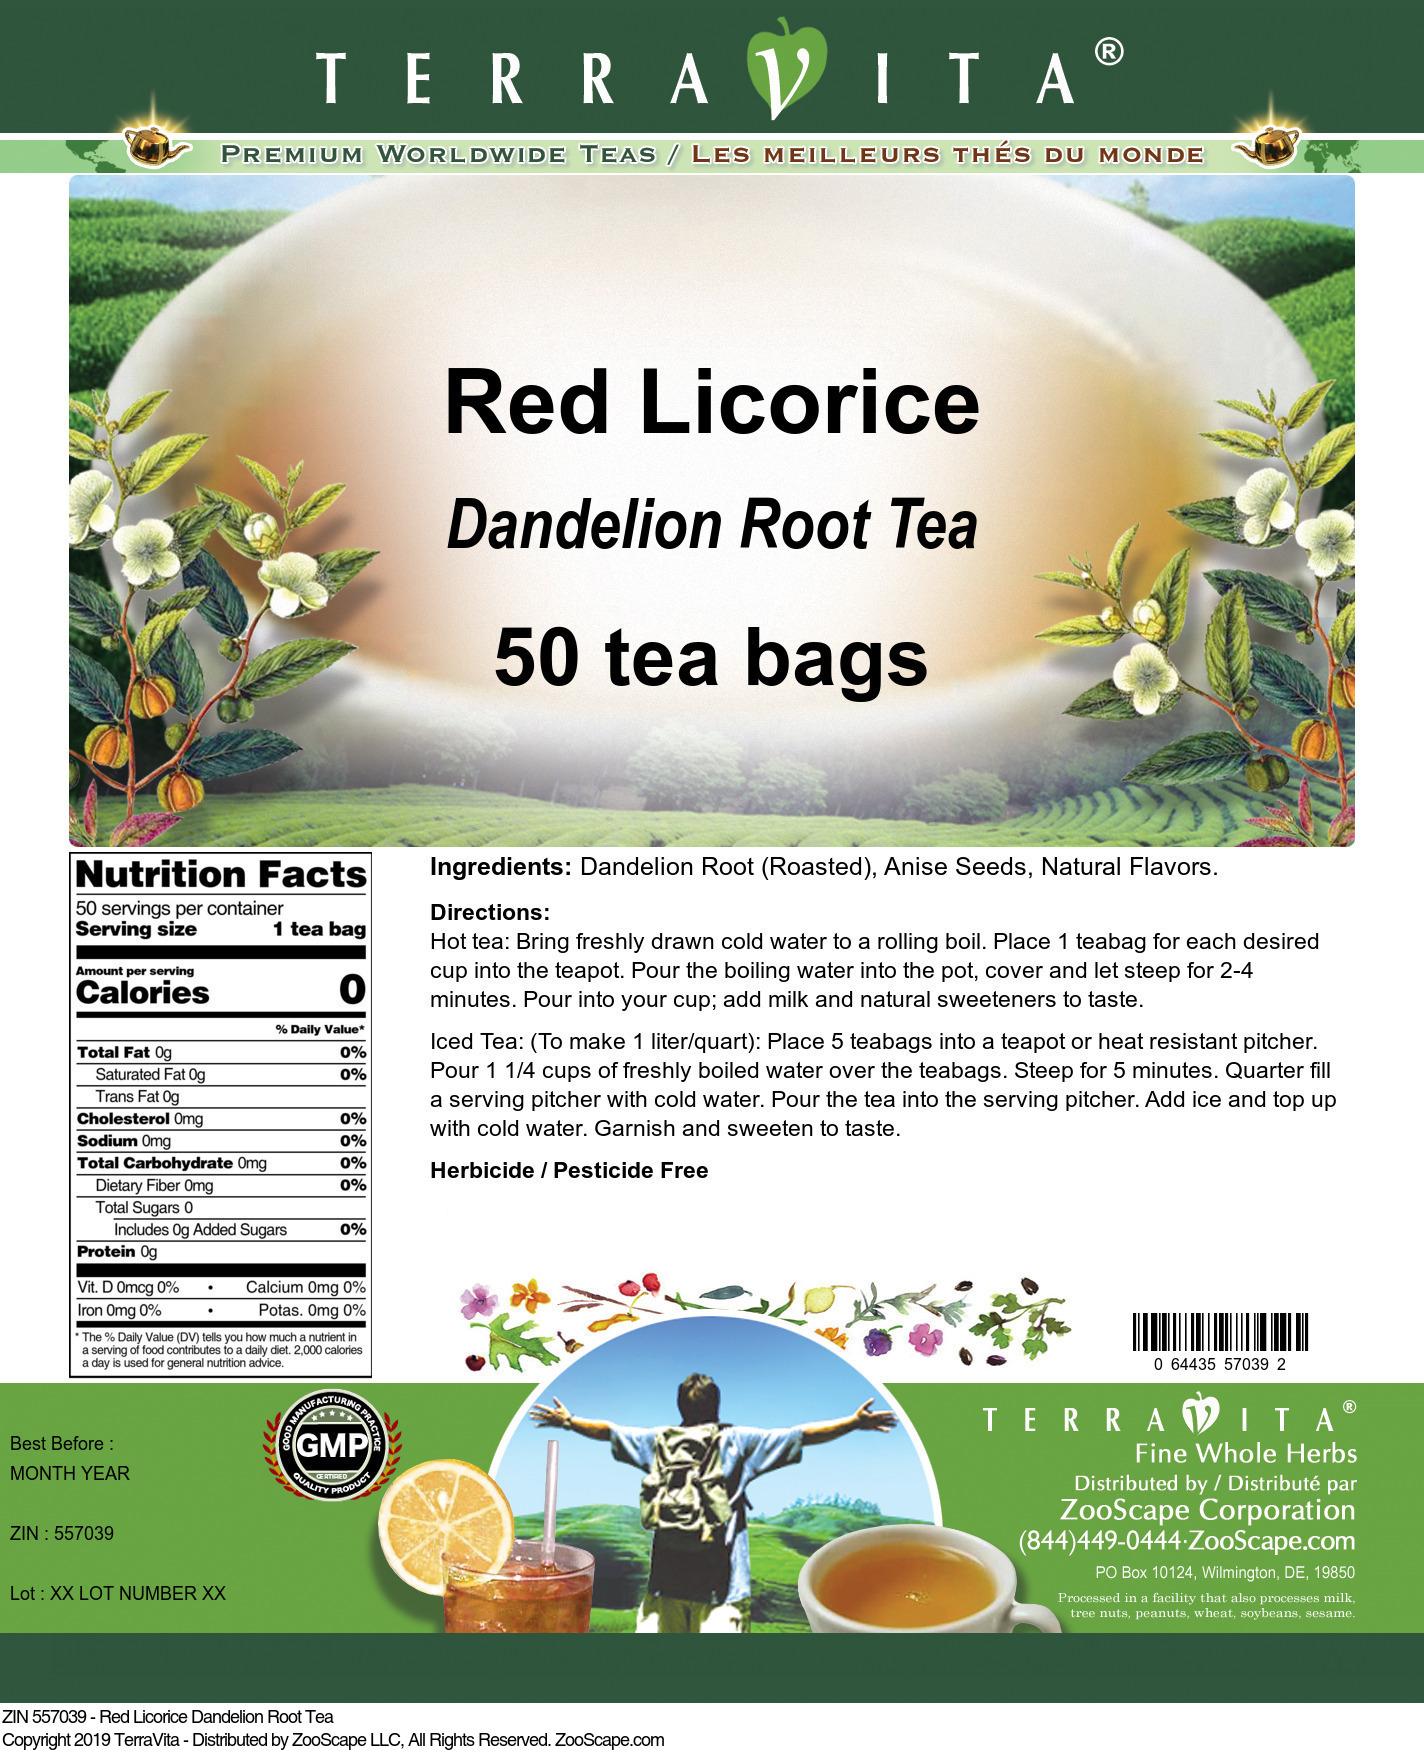 Red Licorice Dandelion Root